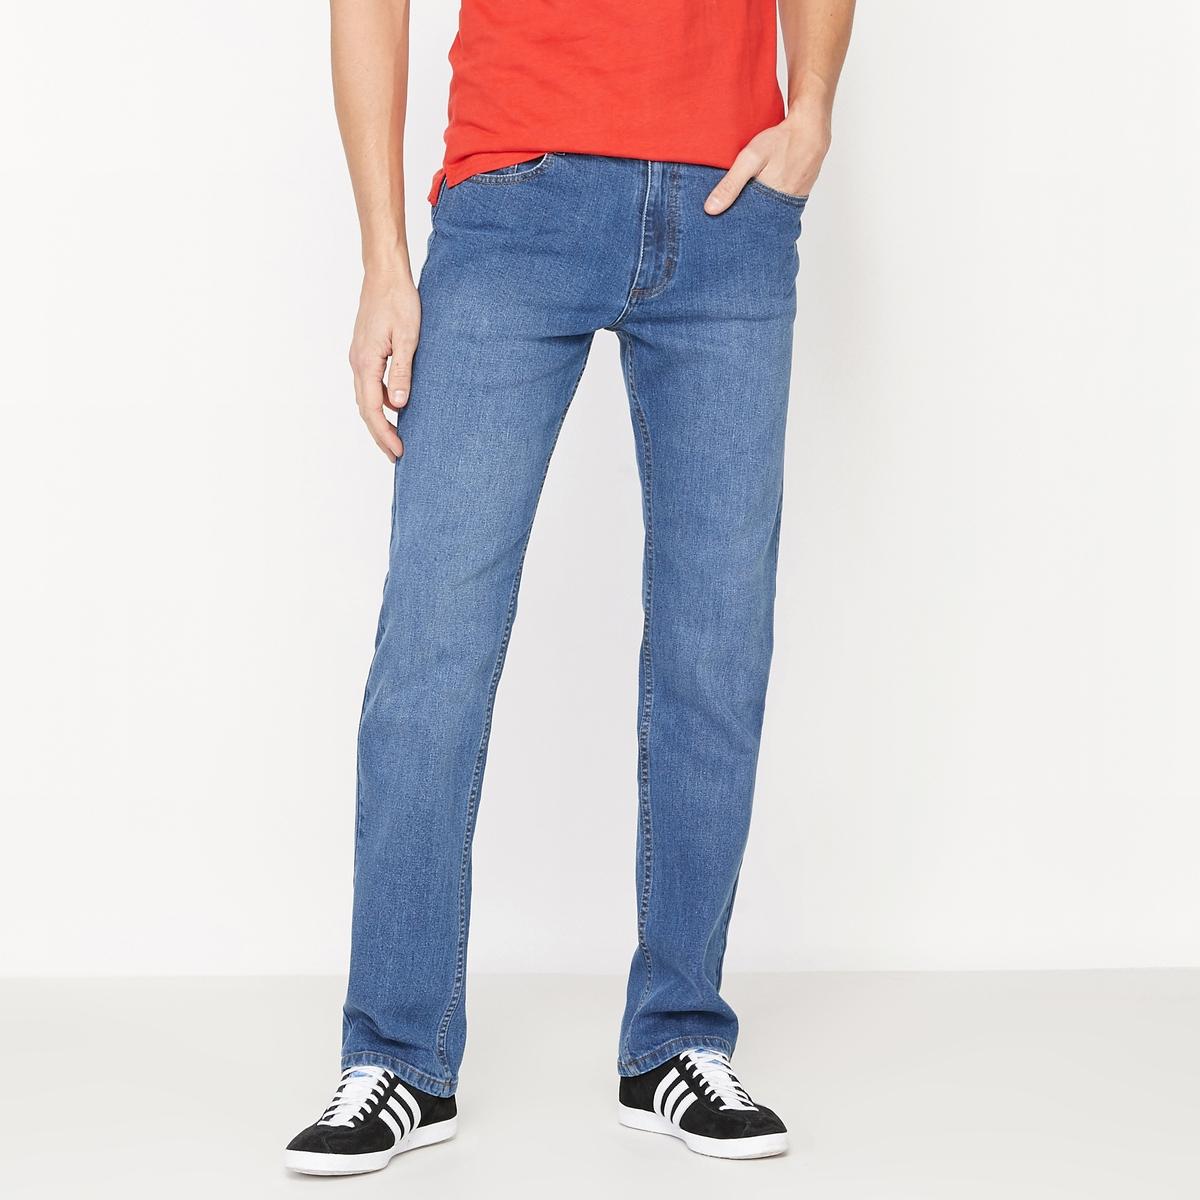 Jeans corte direito, ganga stretch